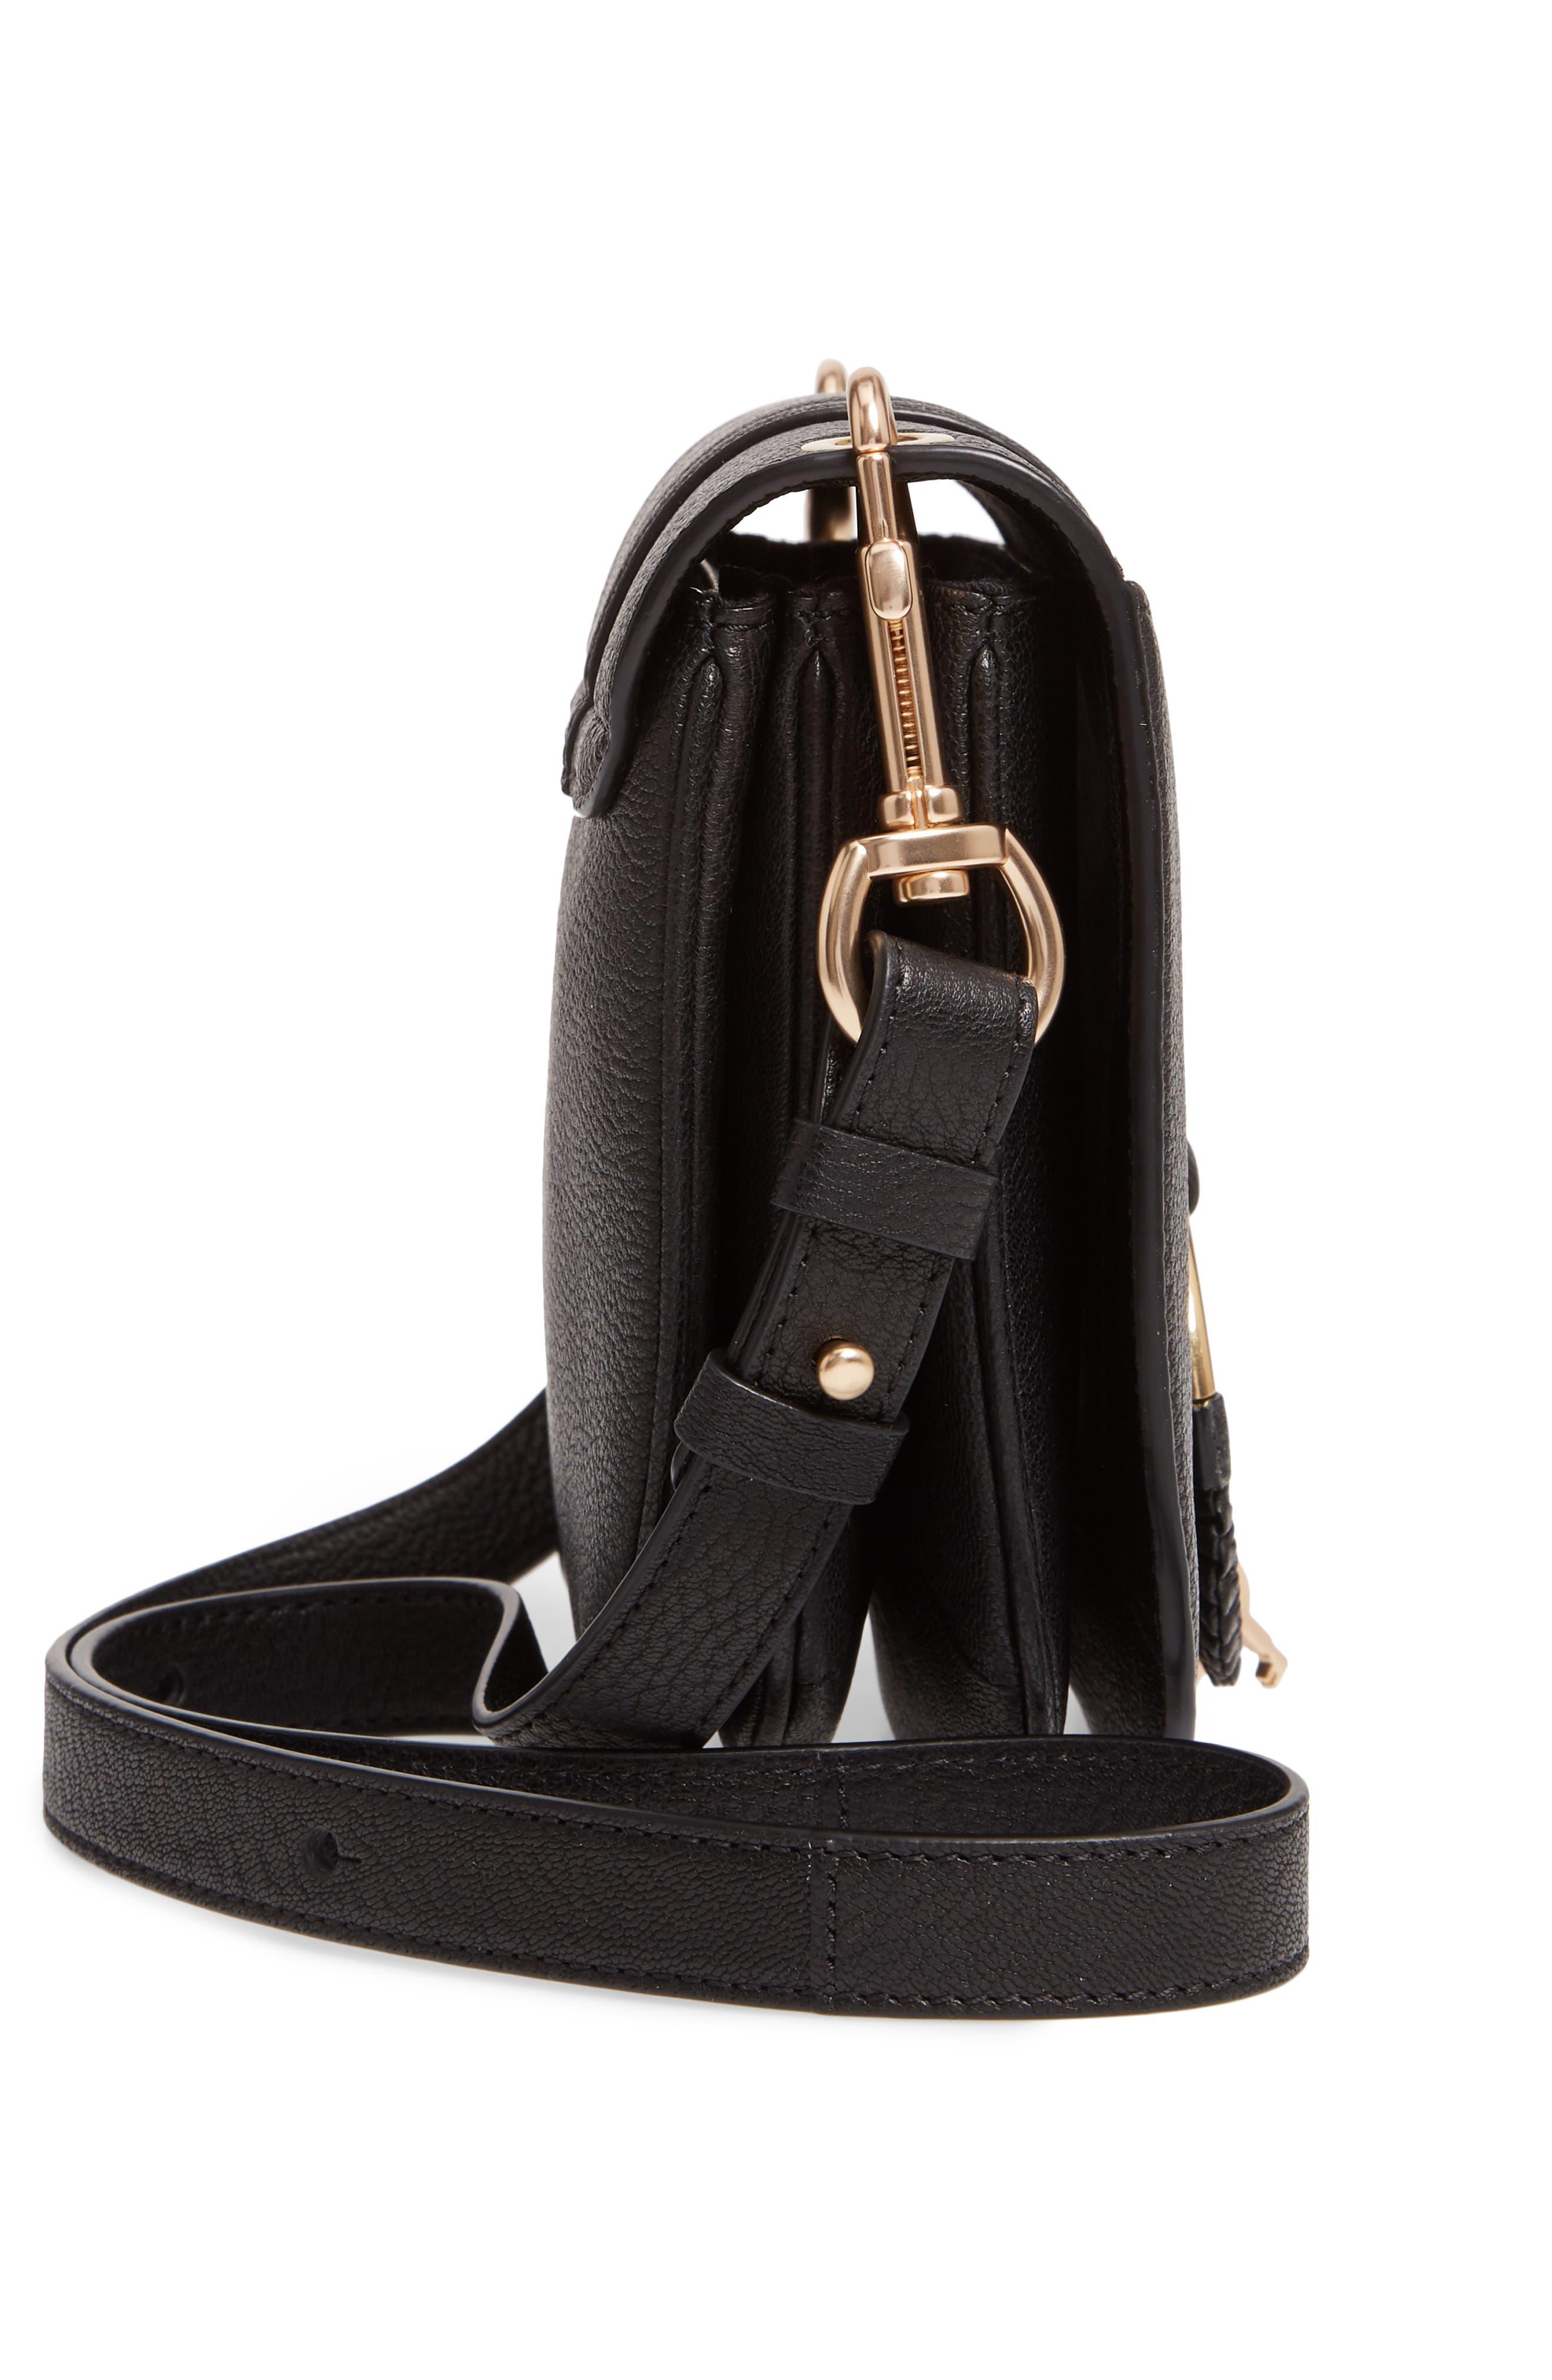 SEE BY CHLOÉ, Hana Small Leather Crossbody Bag, Alternate thumbnail 5, color, 001